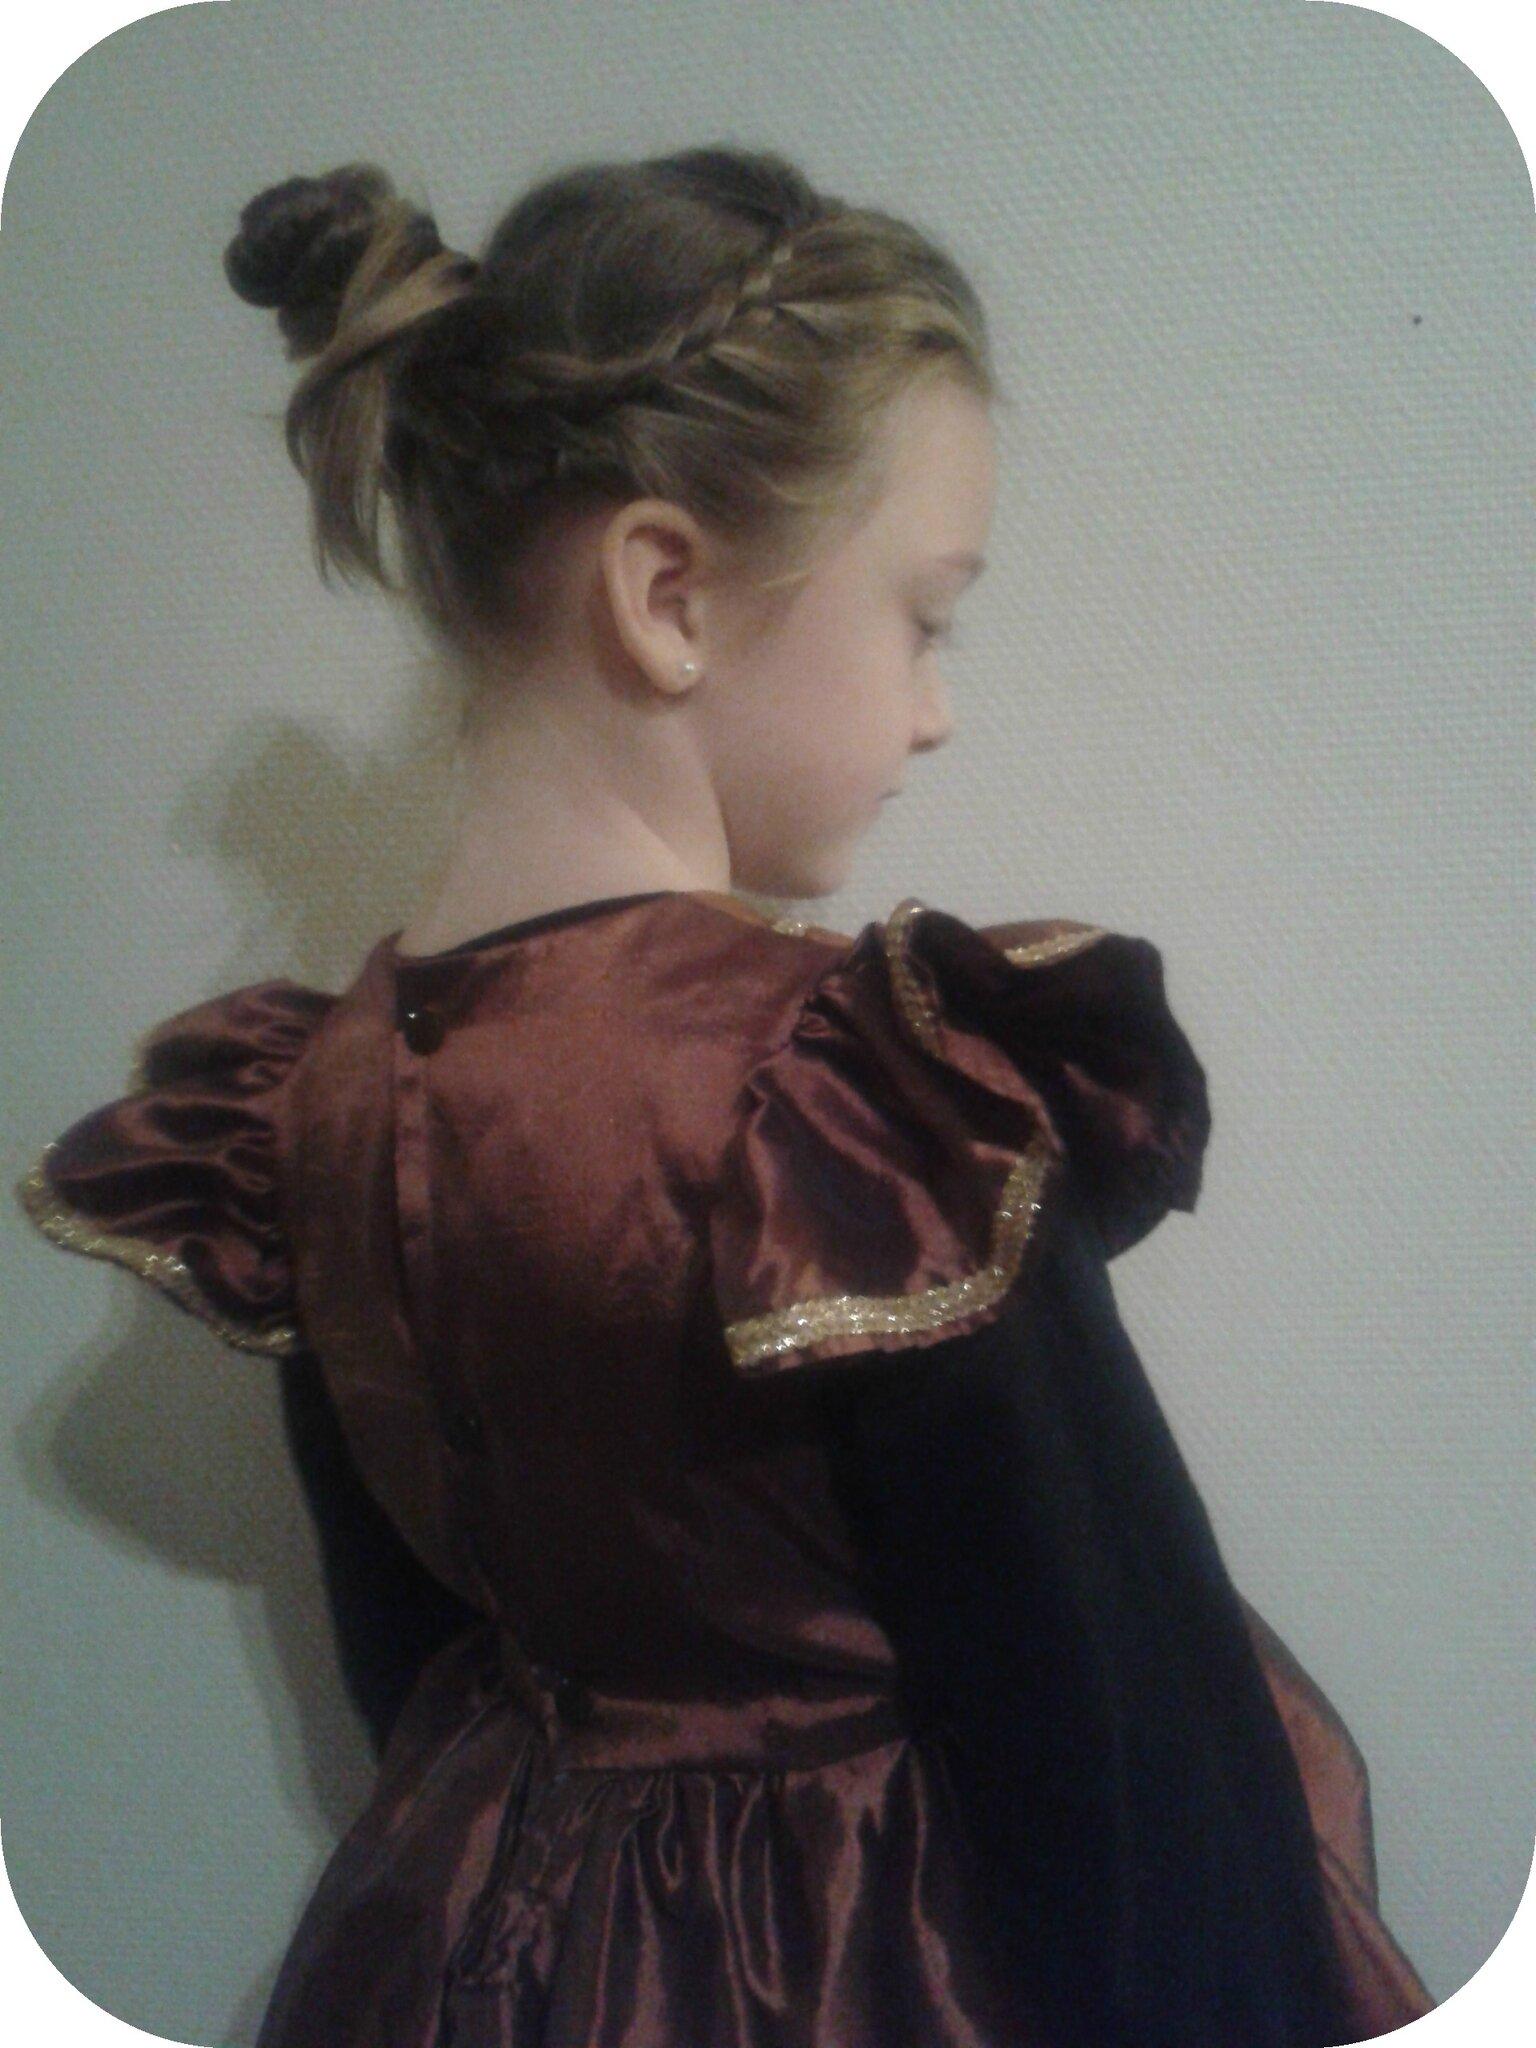 La robe victorienne (Opération Destockage #6)